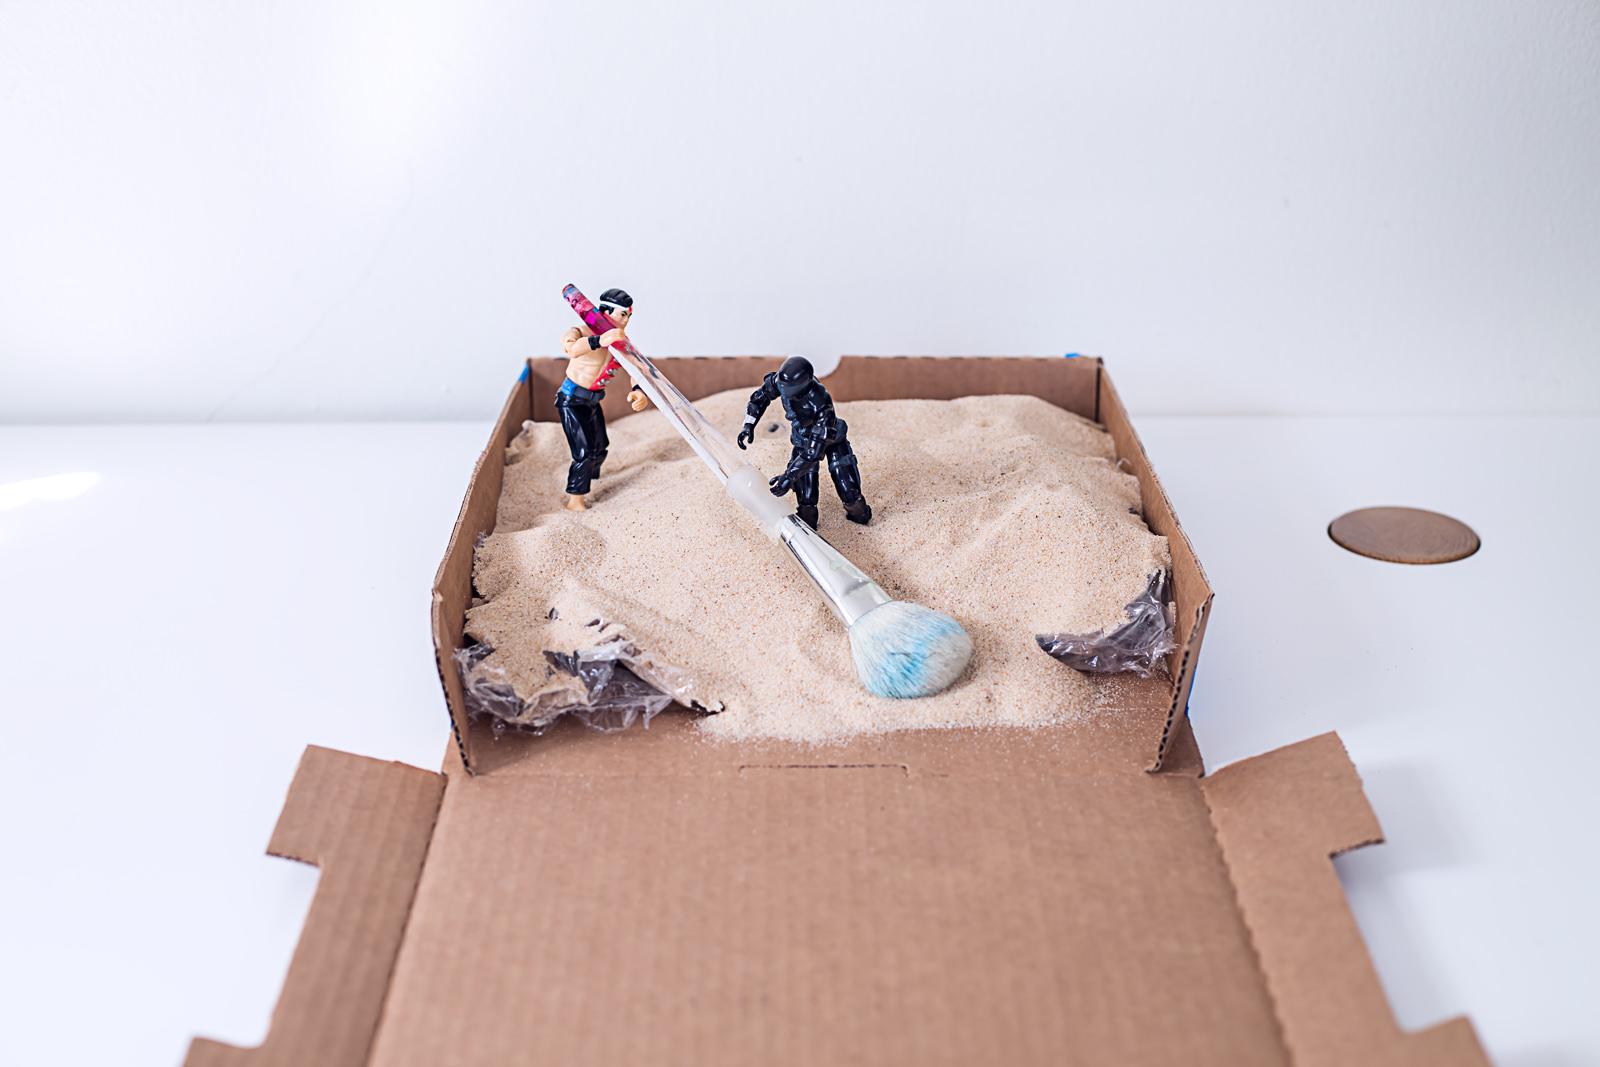 pizza-box-diorama-6.jpg